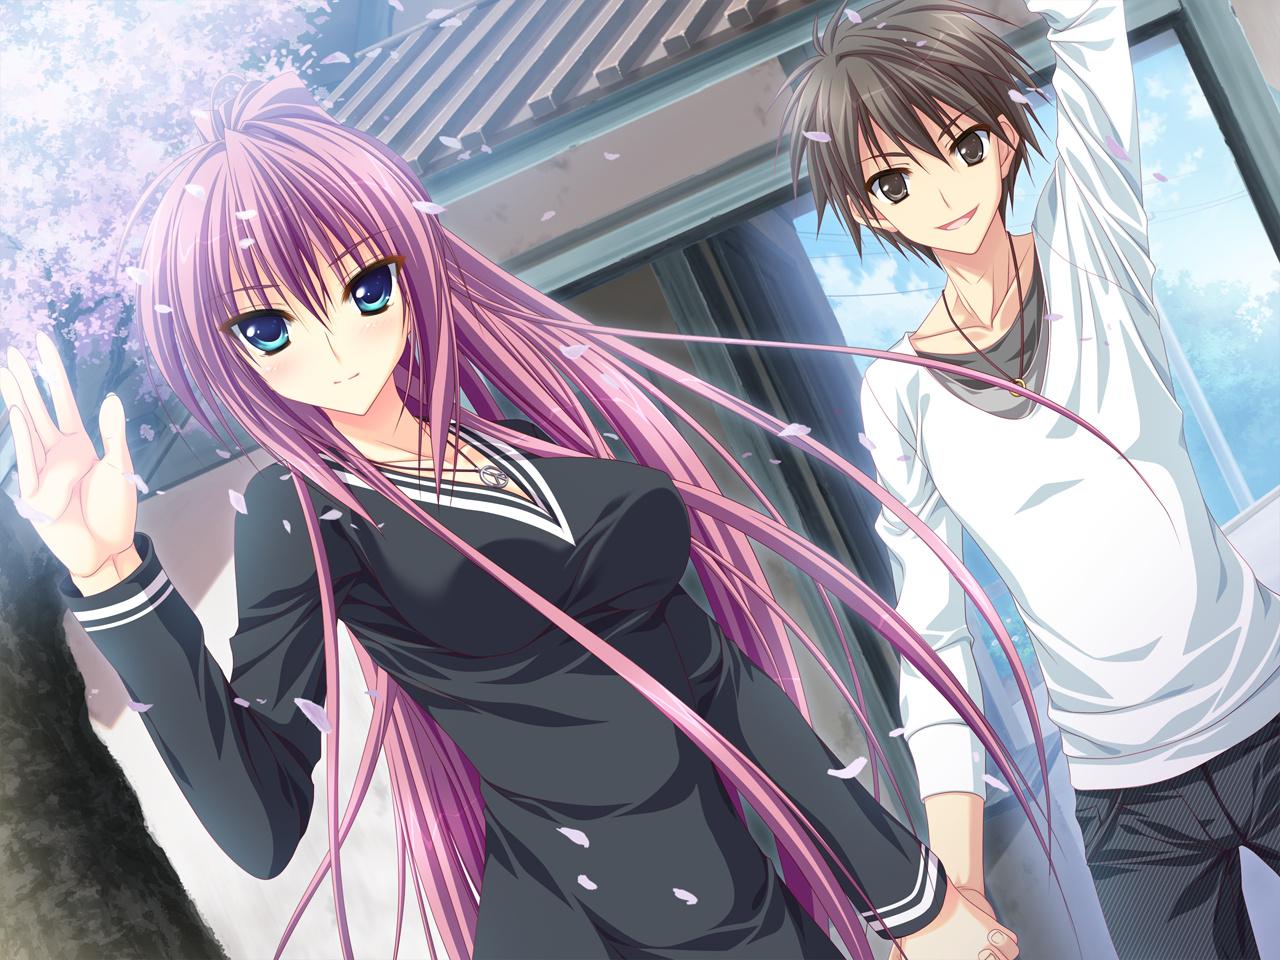 dress feng game_cg green_eyes hoshizora_e_kakaru_hashi naturalton necklace petals purple_hair sakai_hina